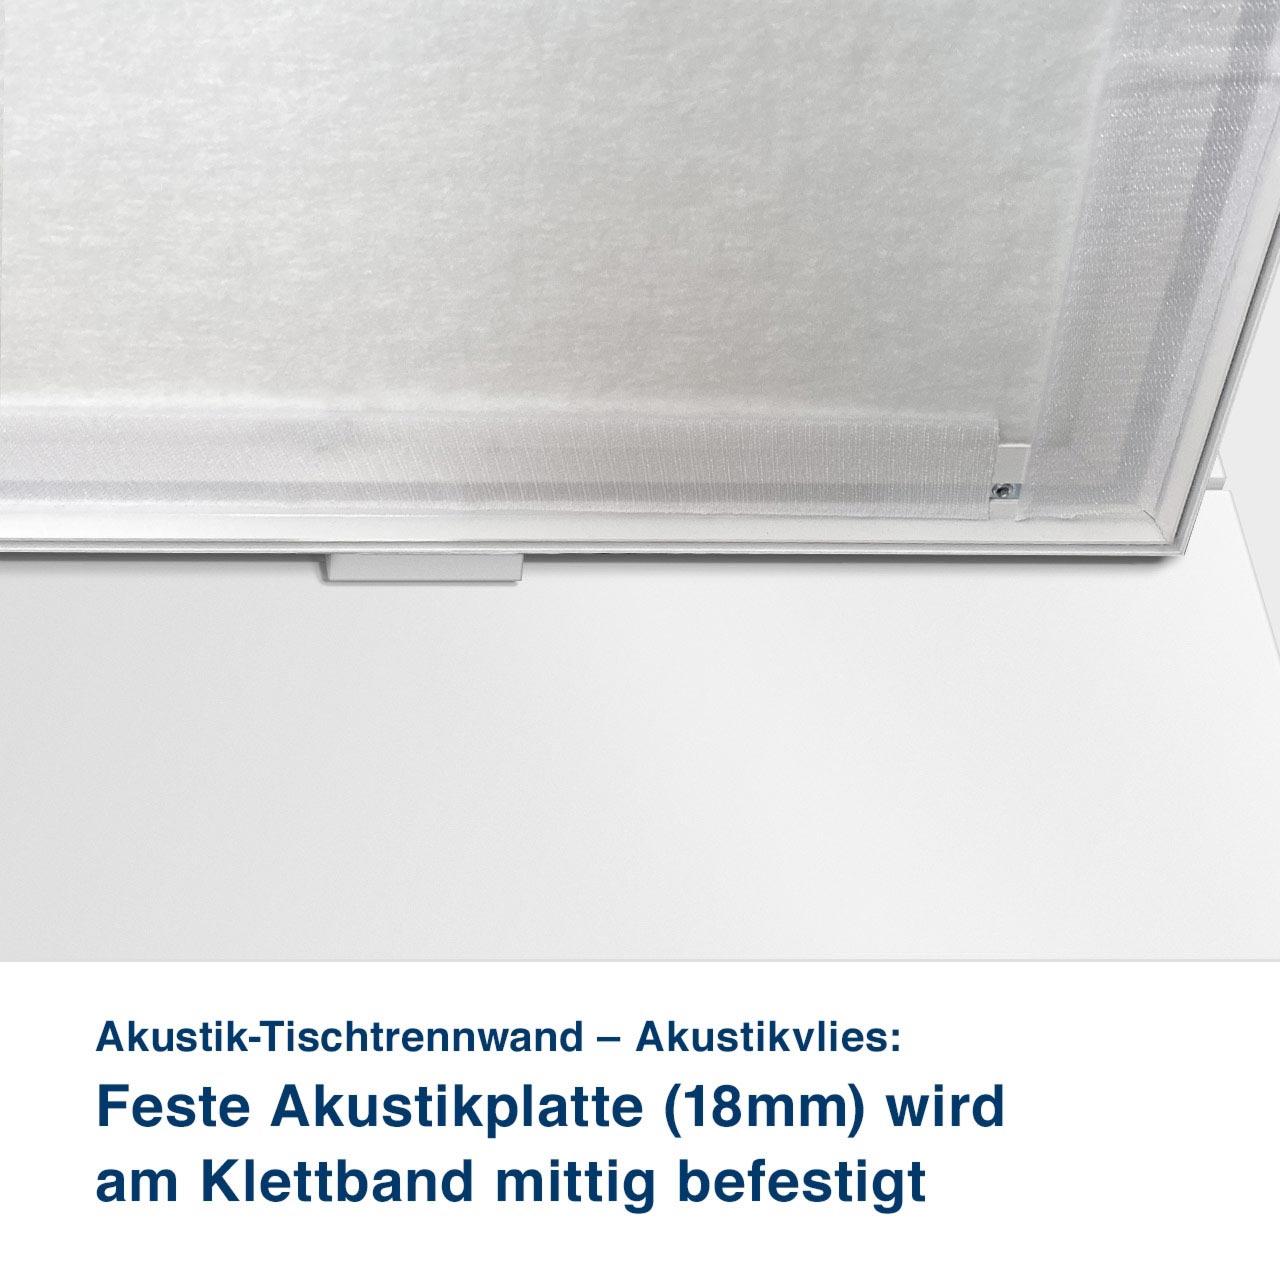 Akustik-Tischtrennwand – Akustikvlies:   Feste Akustikplatte (18mm) wird  am Klettband mittig befestigt